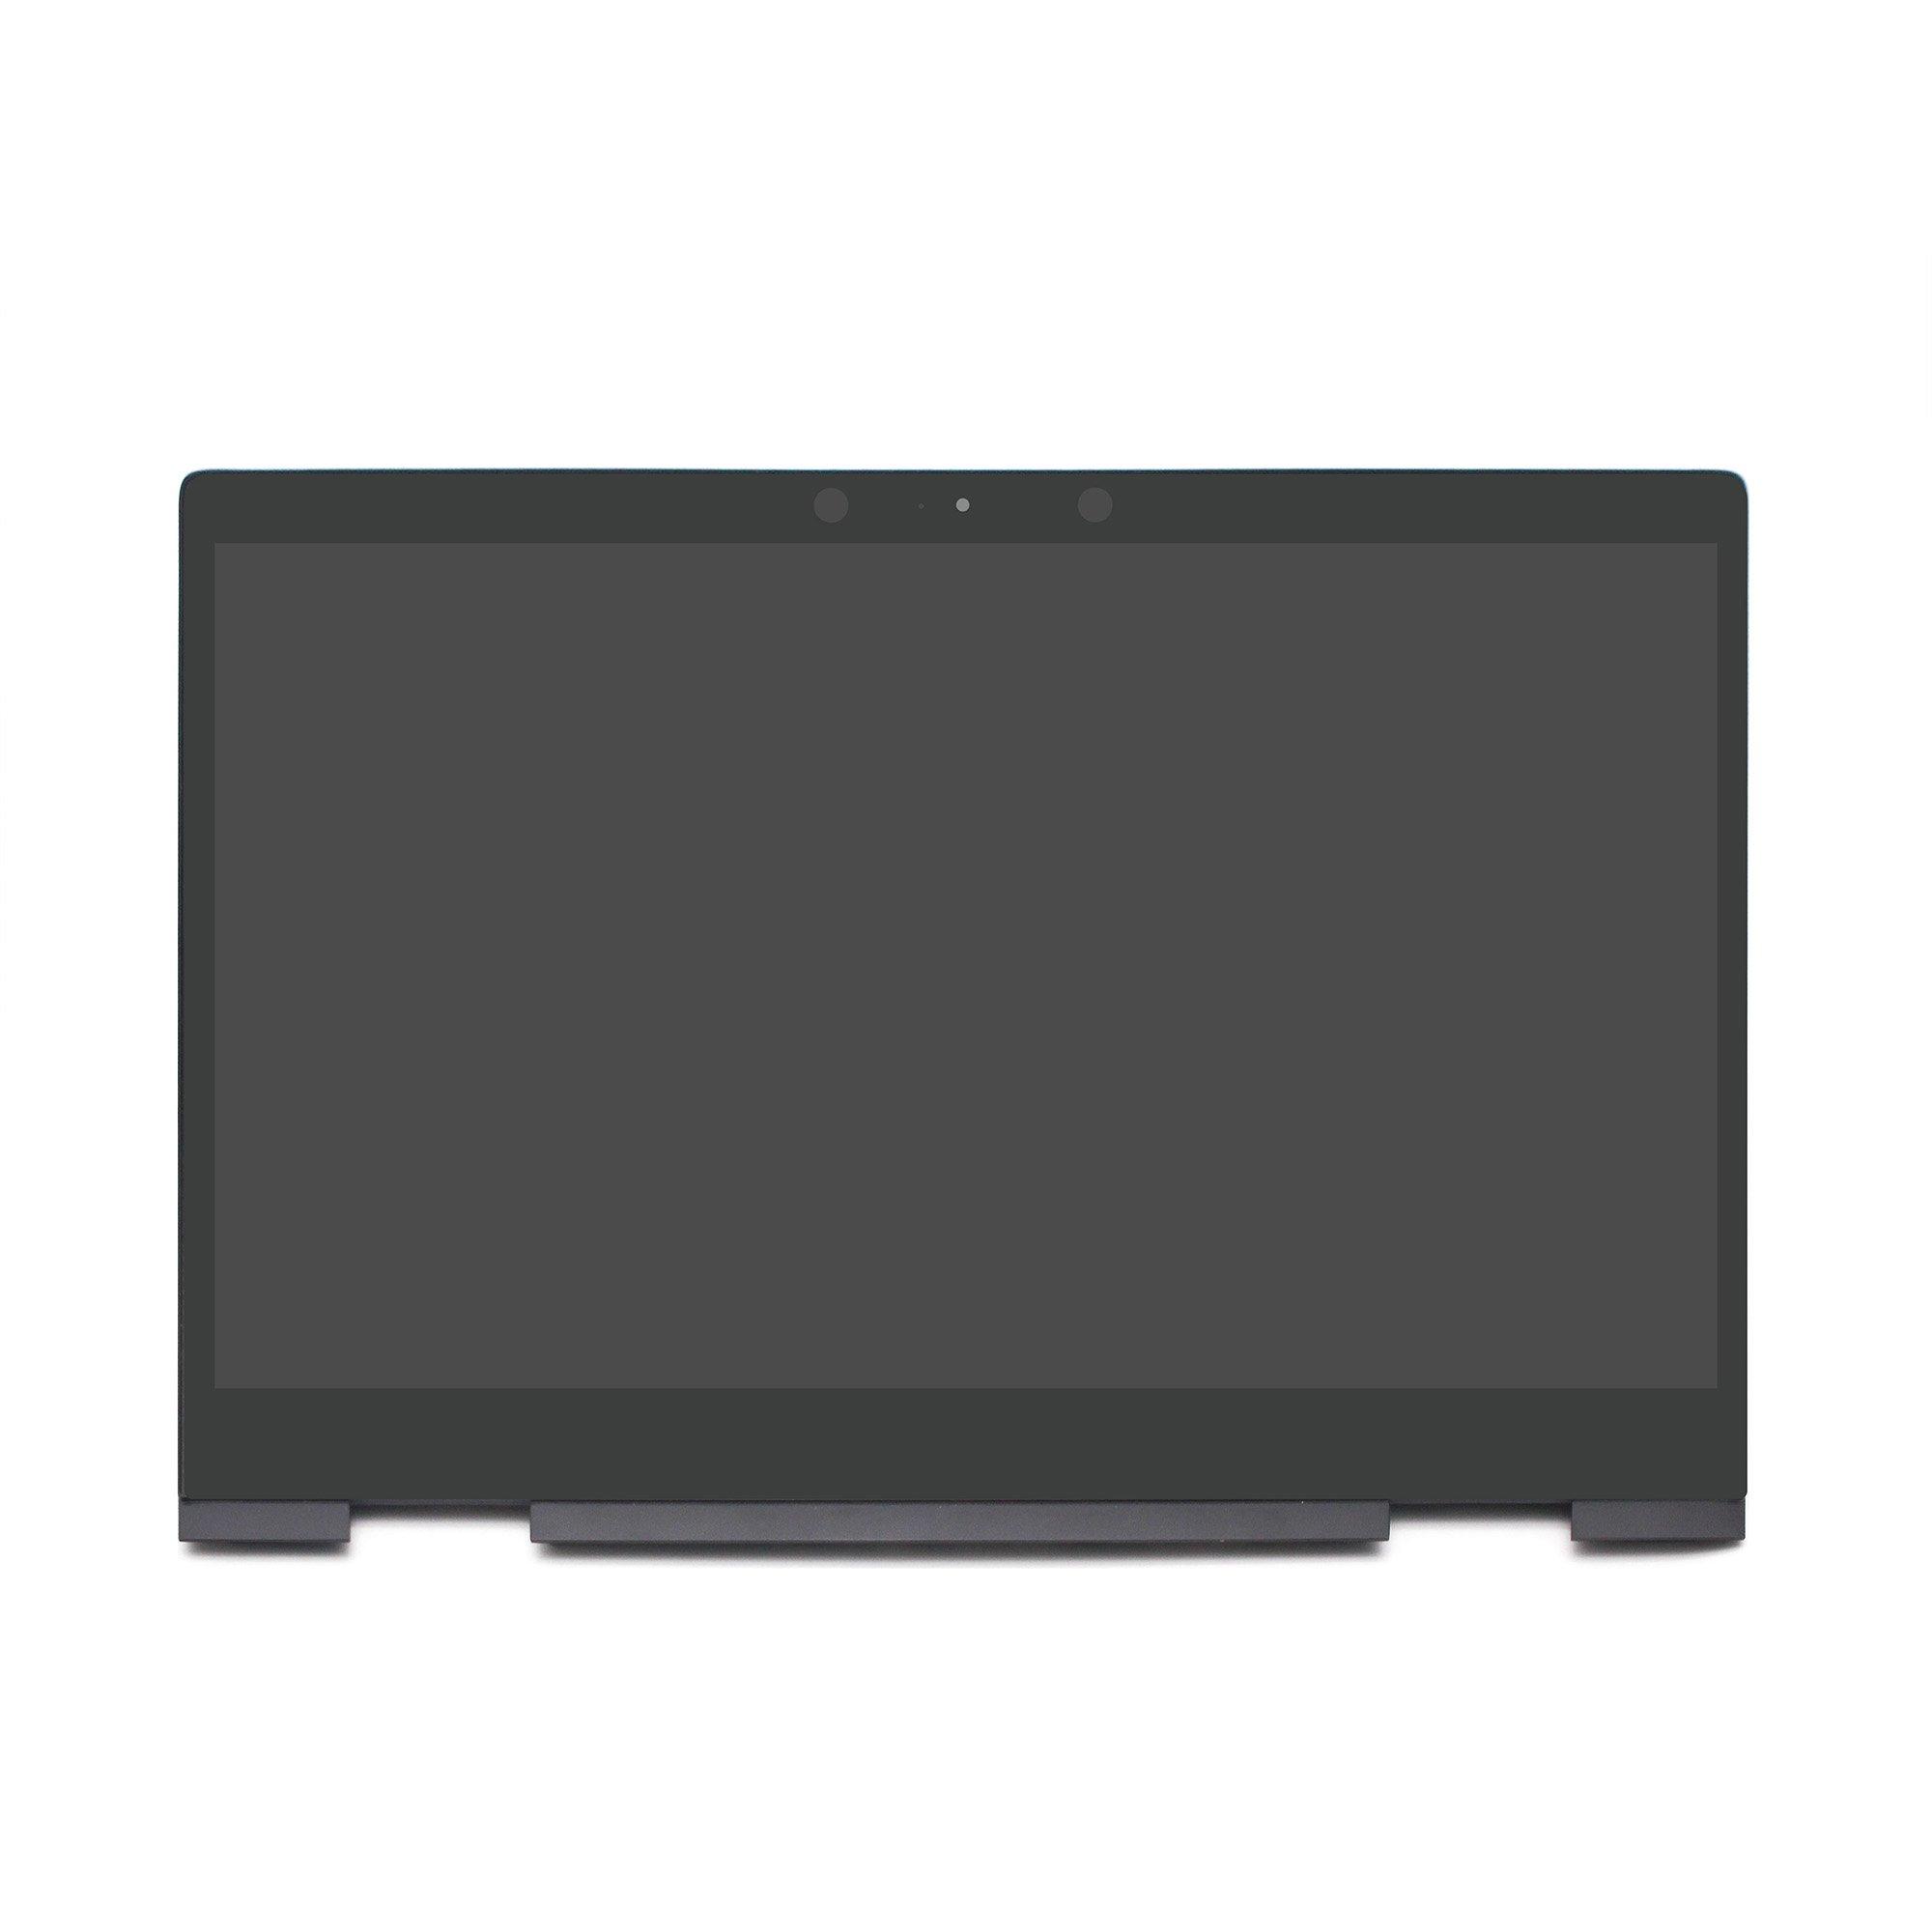 LCDOLED 15.6'' FullHD IPS LCD Touch Screen Digitizer Assembly + Bezel + Board for HP Envy x360 15-bq 15-bq000 15-bq100 15m-bq000 15m-bq100 15m-bq021dx 15m-bq121dx 15-bq175nr 15-bq075nr 15-bq051nr by LCDOLED (Image #1)